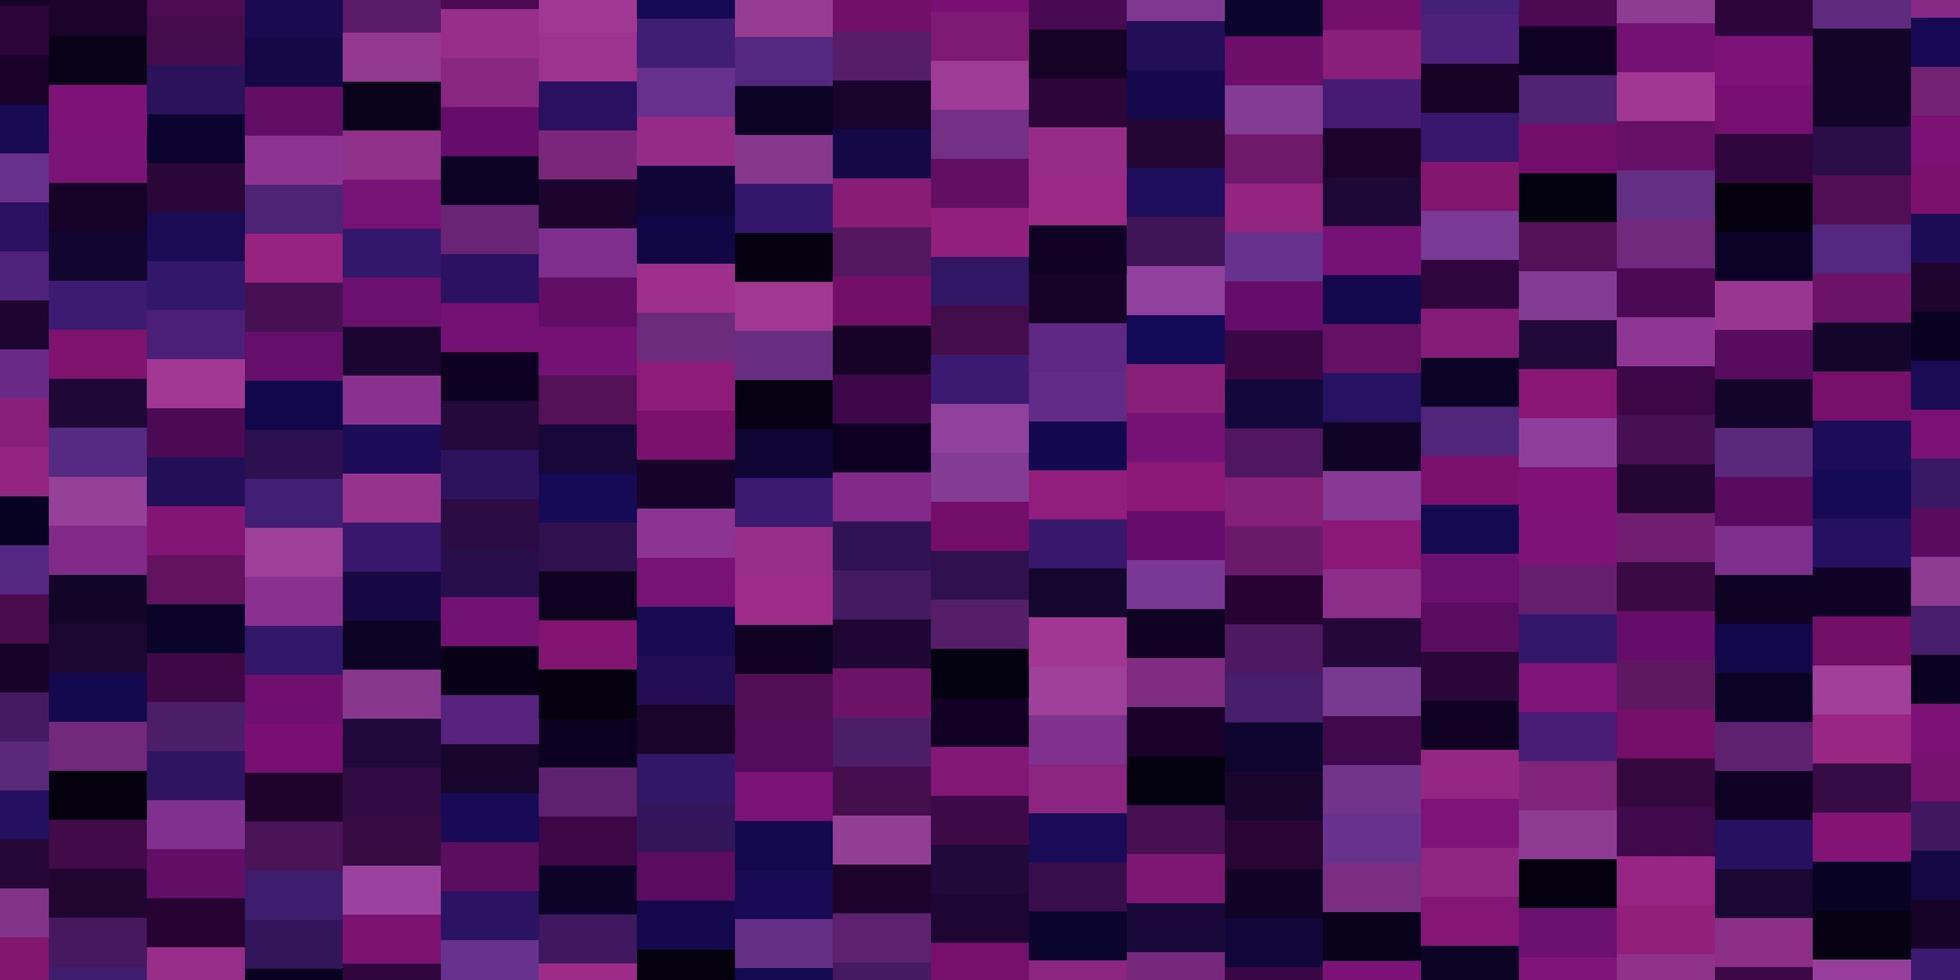 mörkrosa vektormönster i fyrkantig stil. vektor